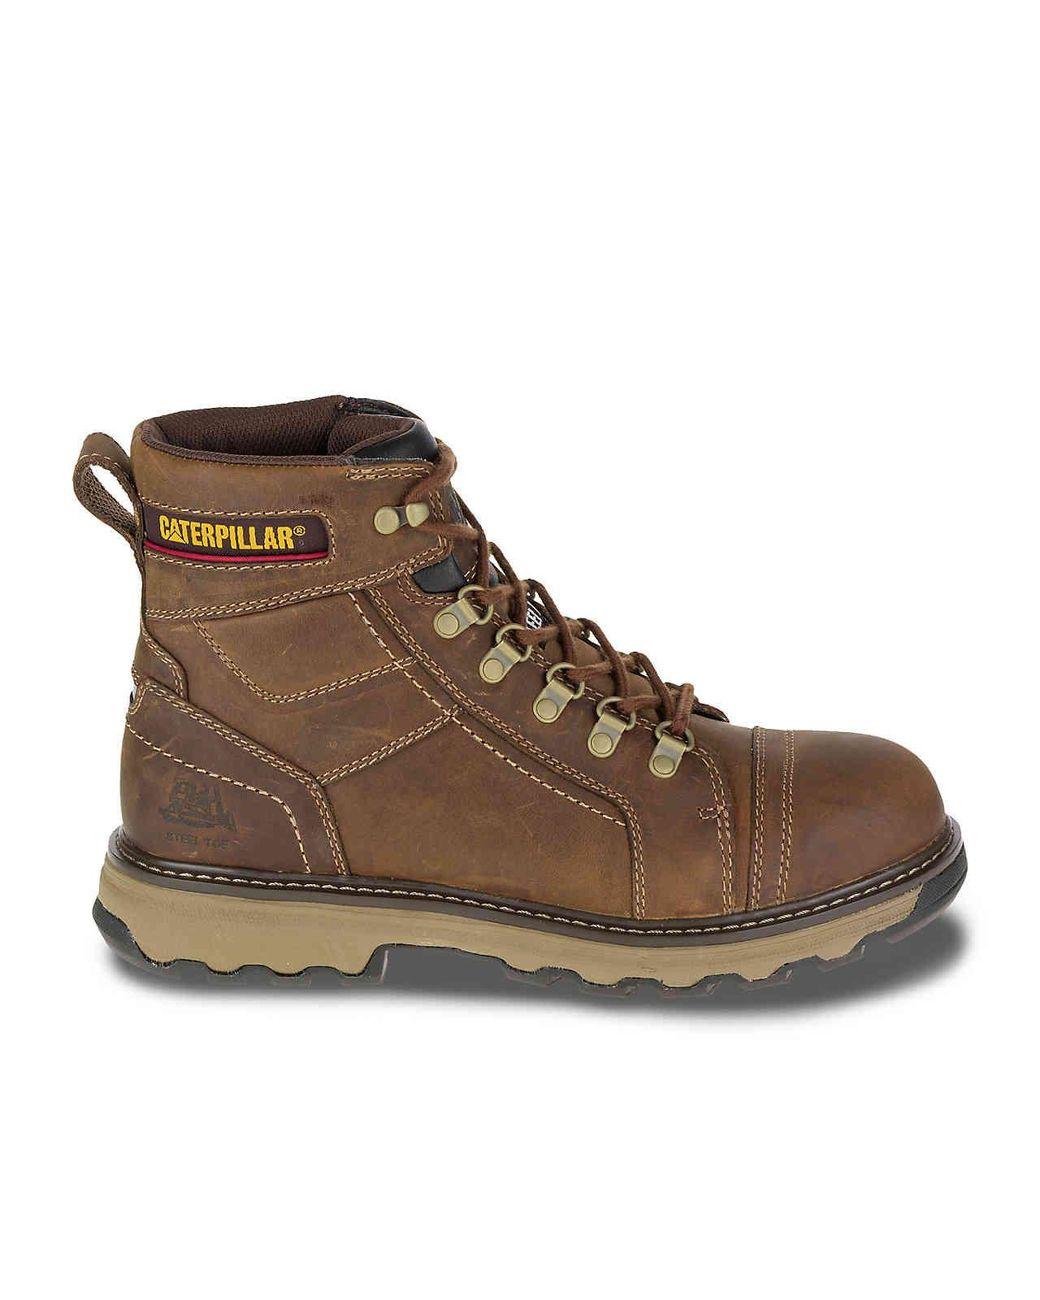 b9f3f5aab38 Lyst - Caterpillar Granger Steel Toe Work Boot in Brown for Men